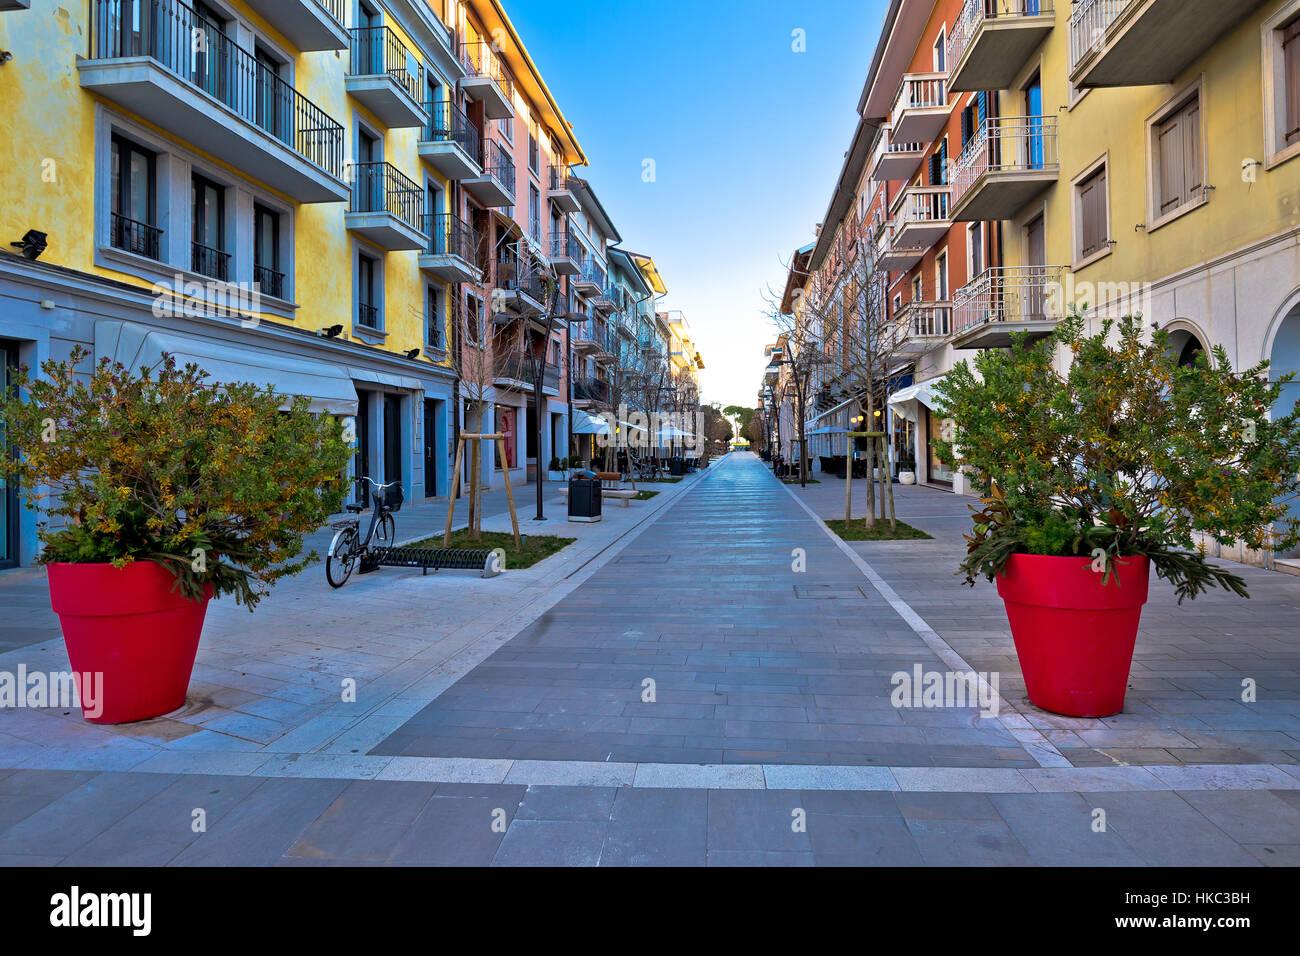 Town of grado tourist promenade street view, Friuli Venezia Giulia region of Italy - Stock Image